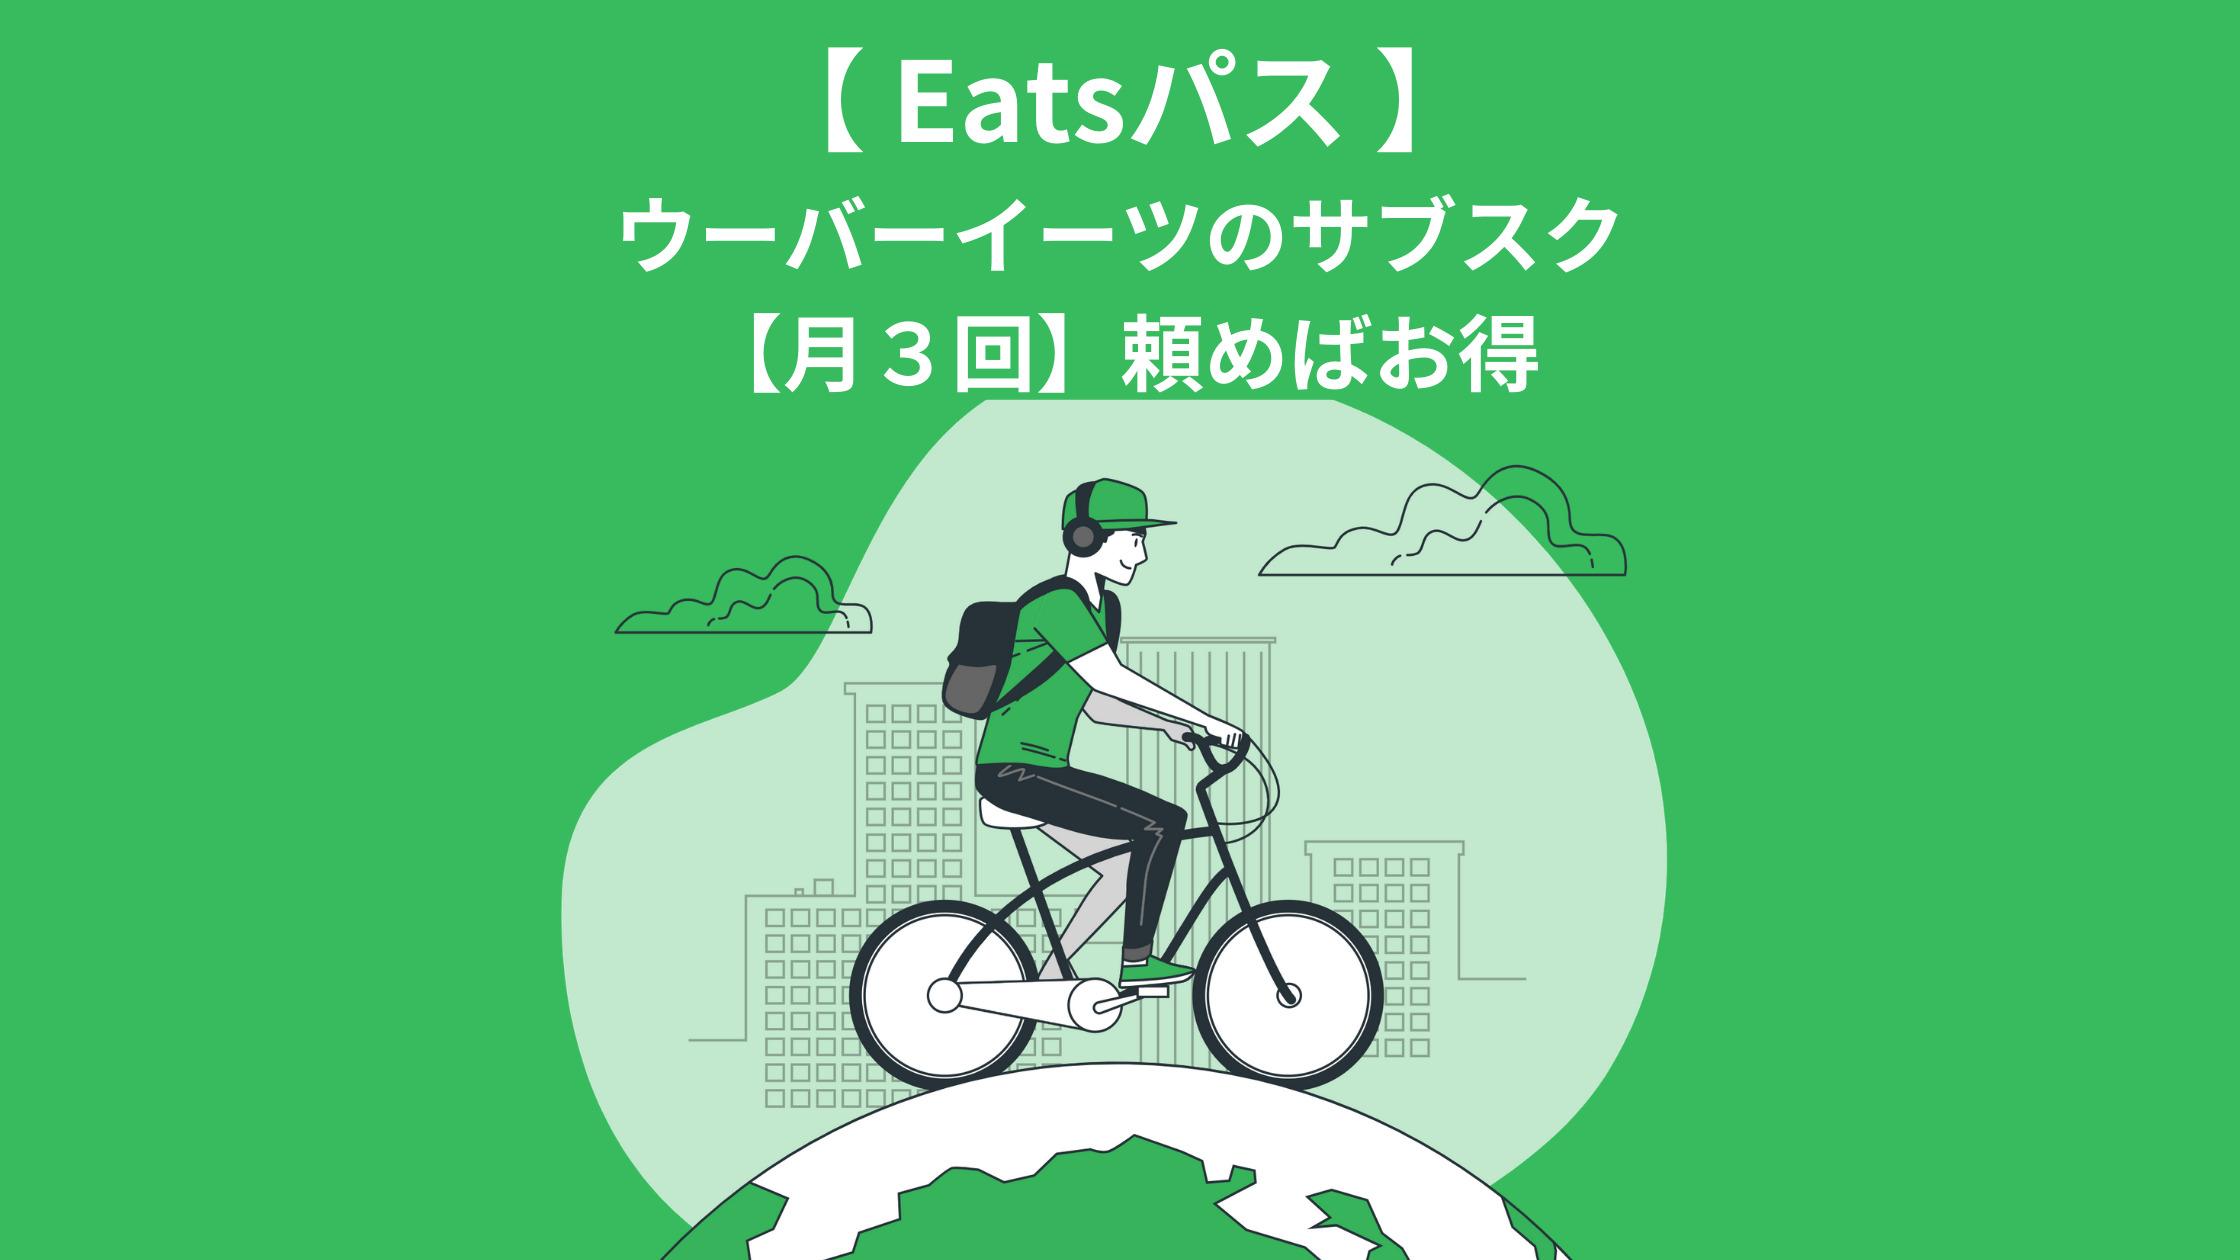 【 Eatsパス 】 ウーバーイーツのサブスク 【月3回】頼めばお得